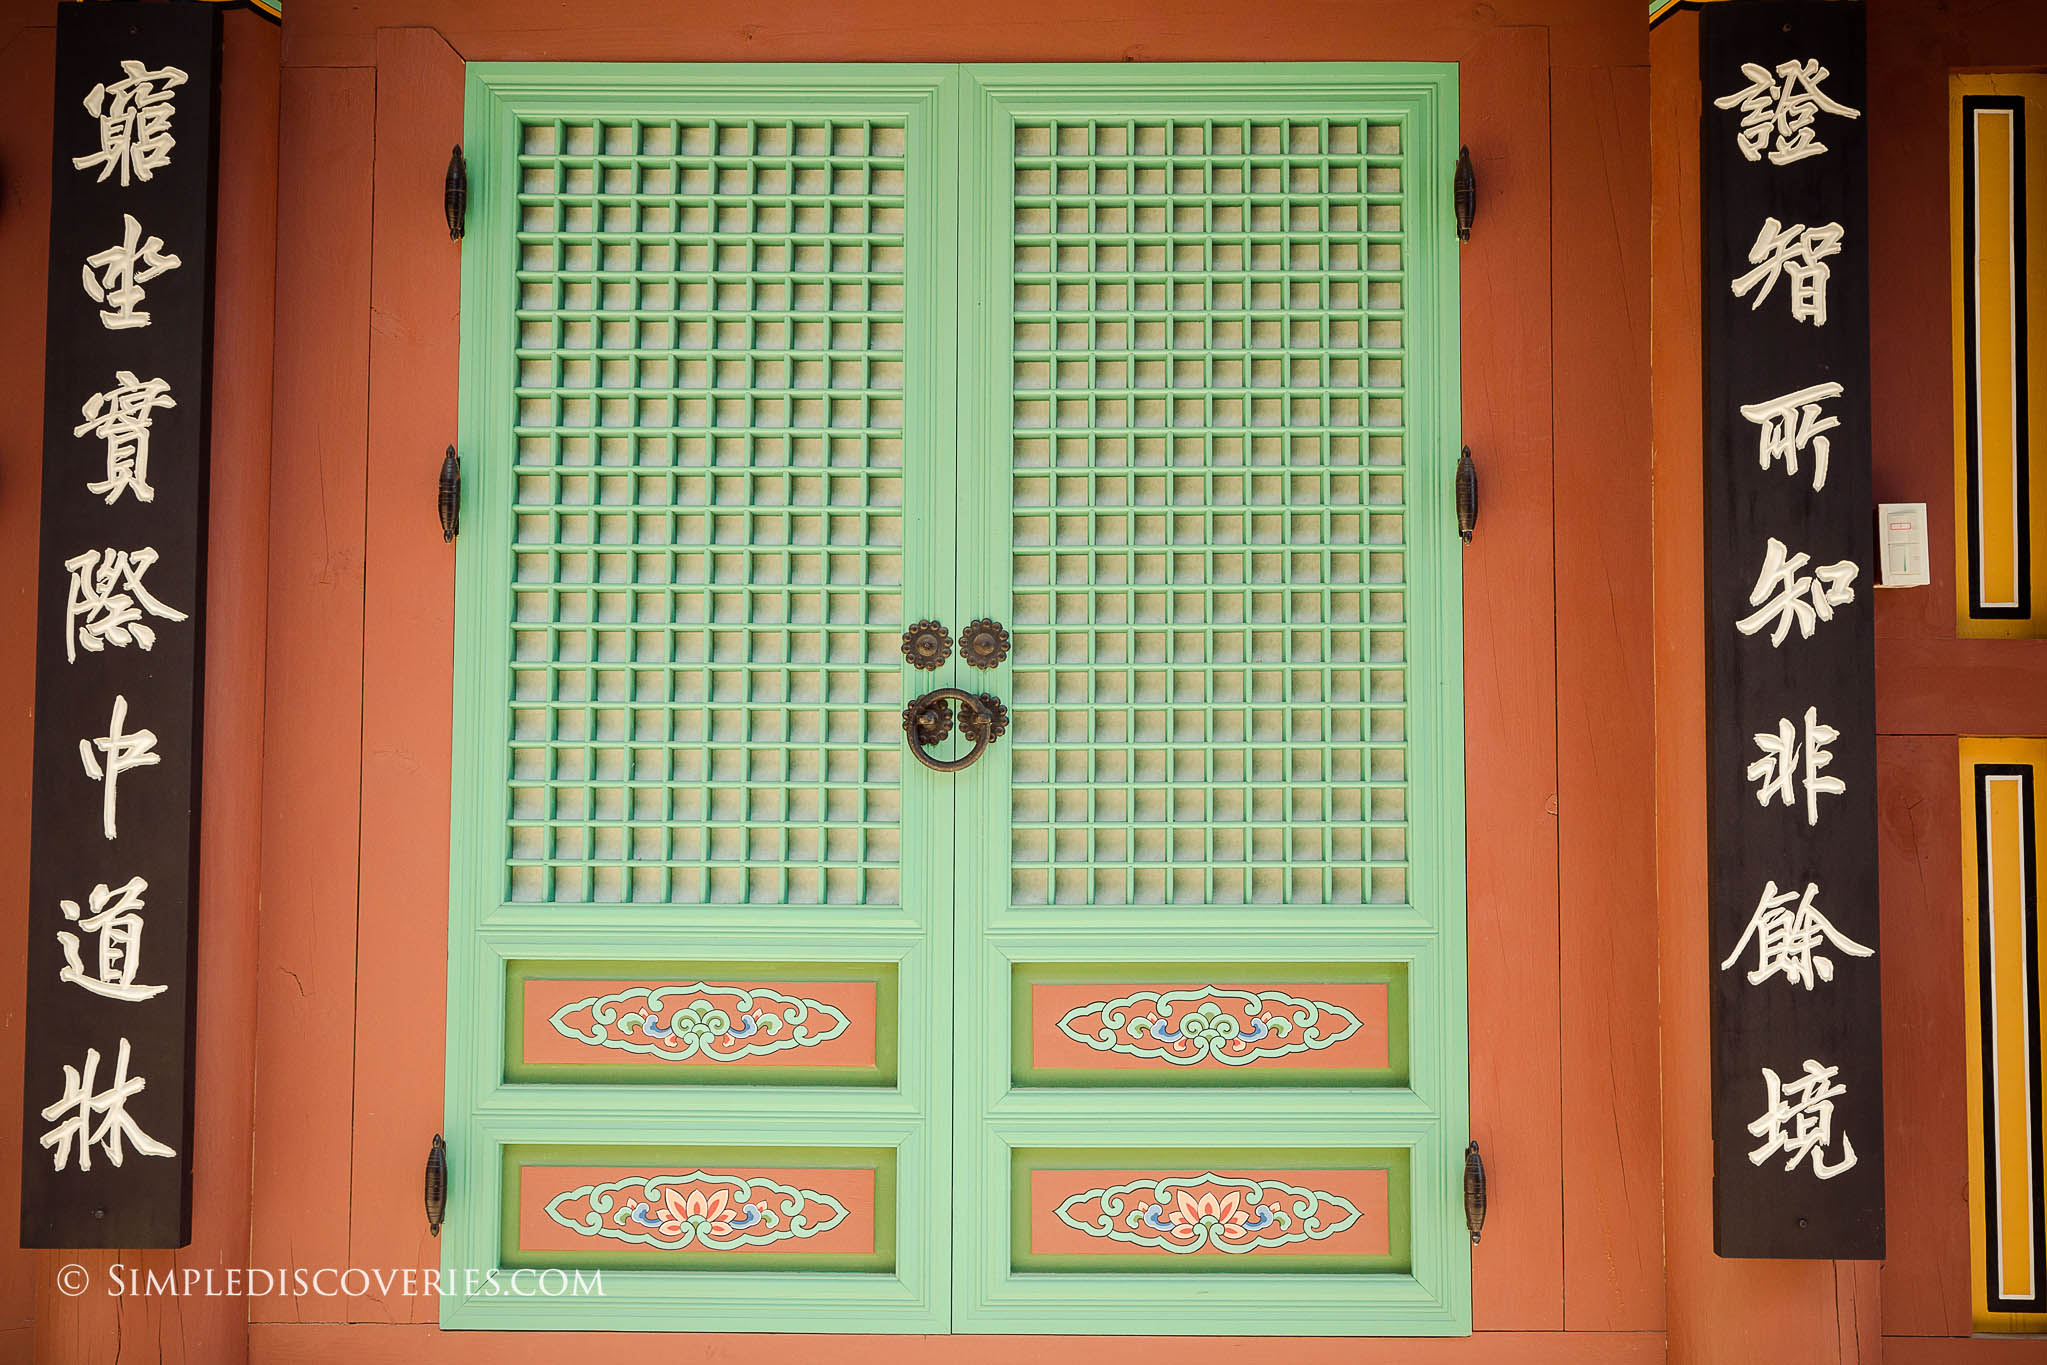 Beomeosa_Temple_Doors_Korea